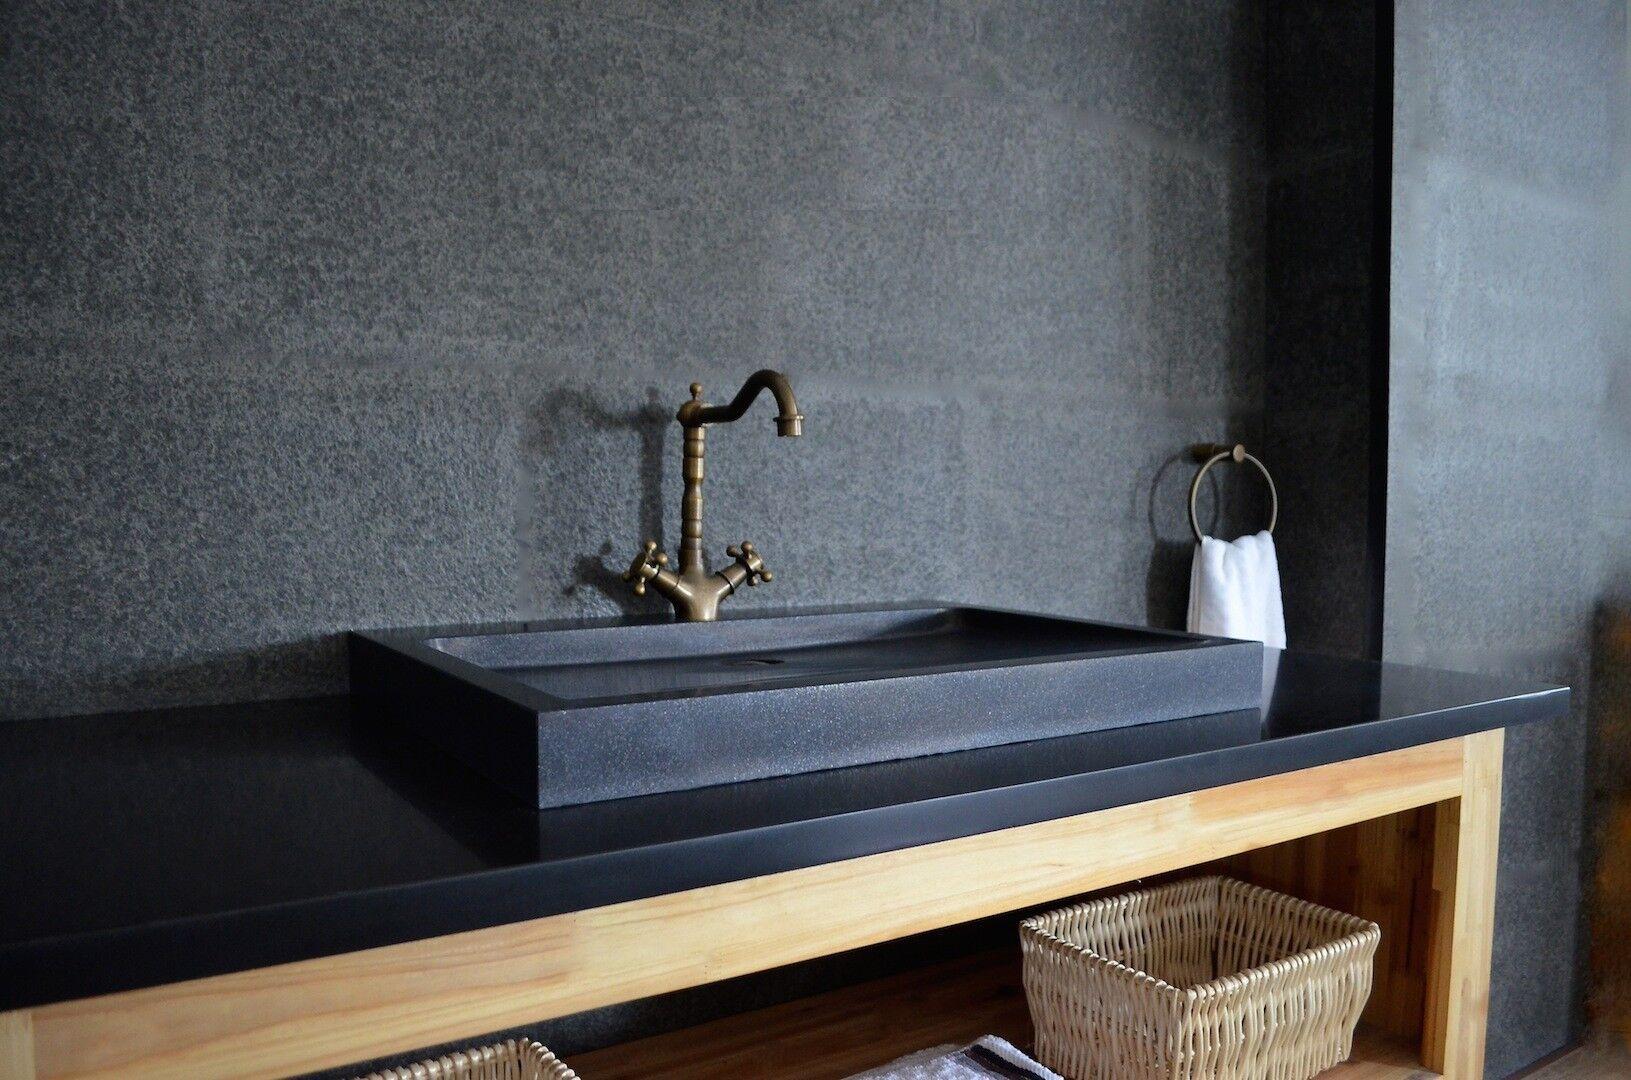 LivingRoc Vasque à poser salle de bain granit noir Luxe CALVI SHADOW